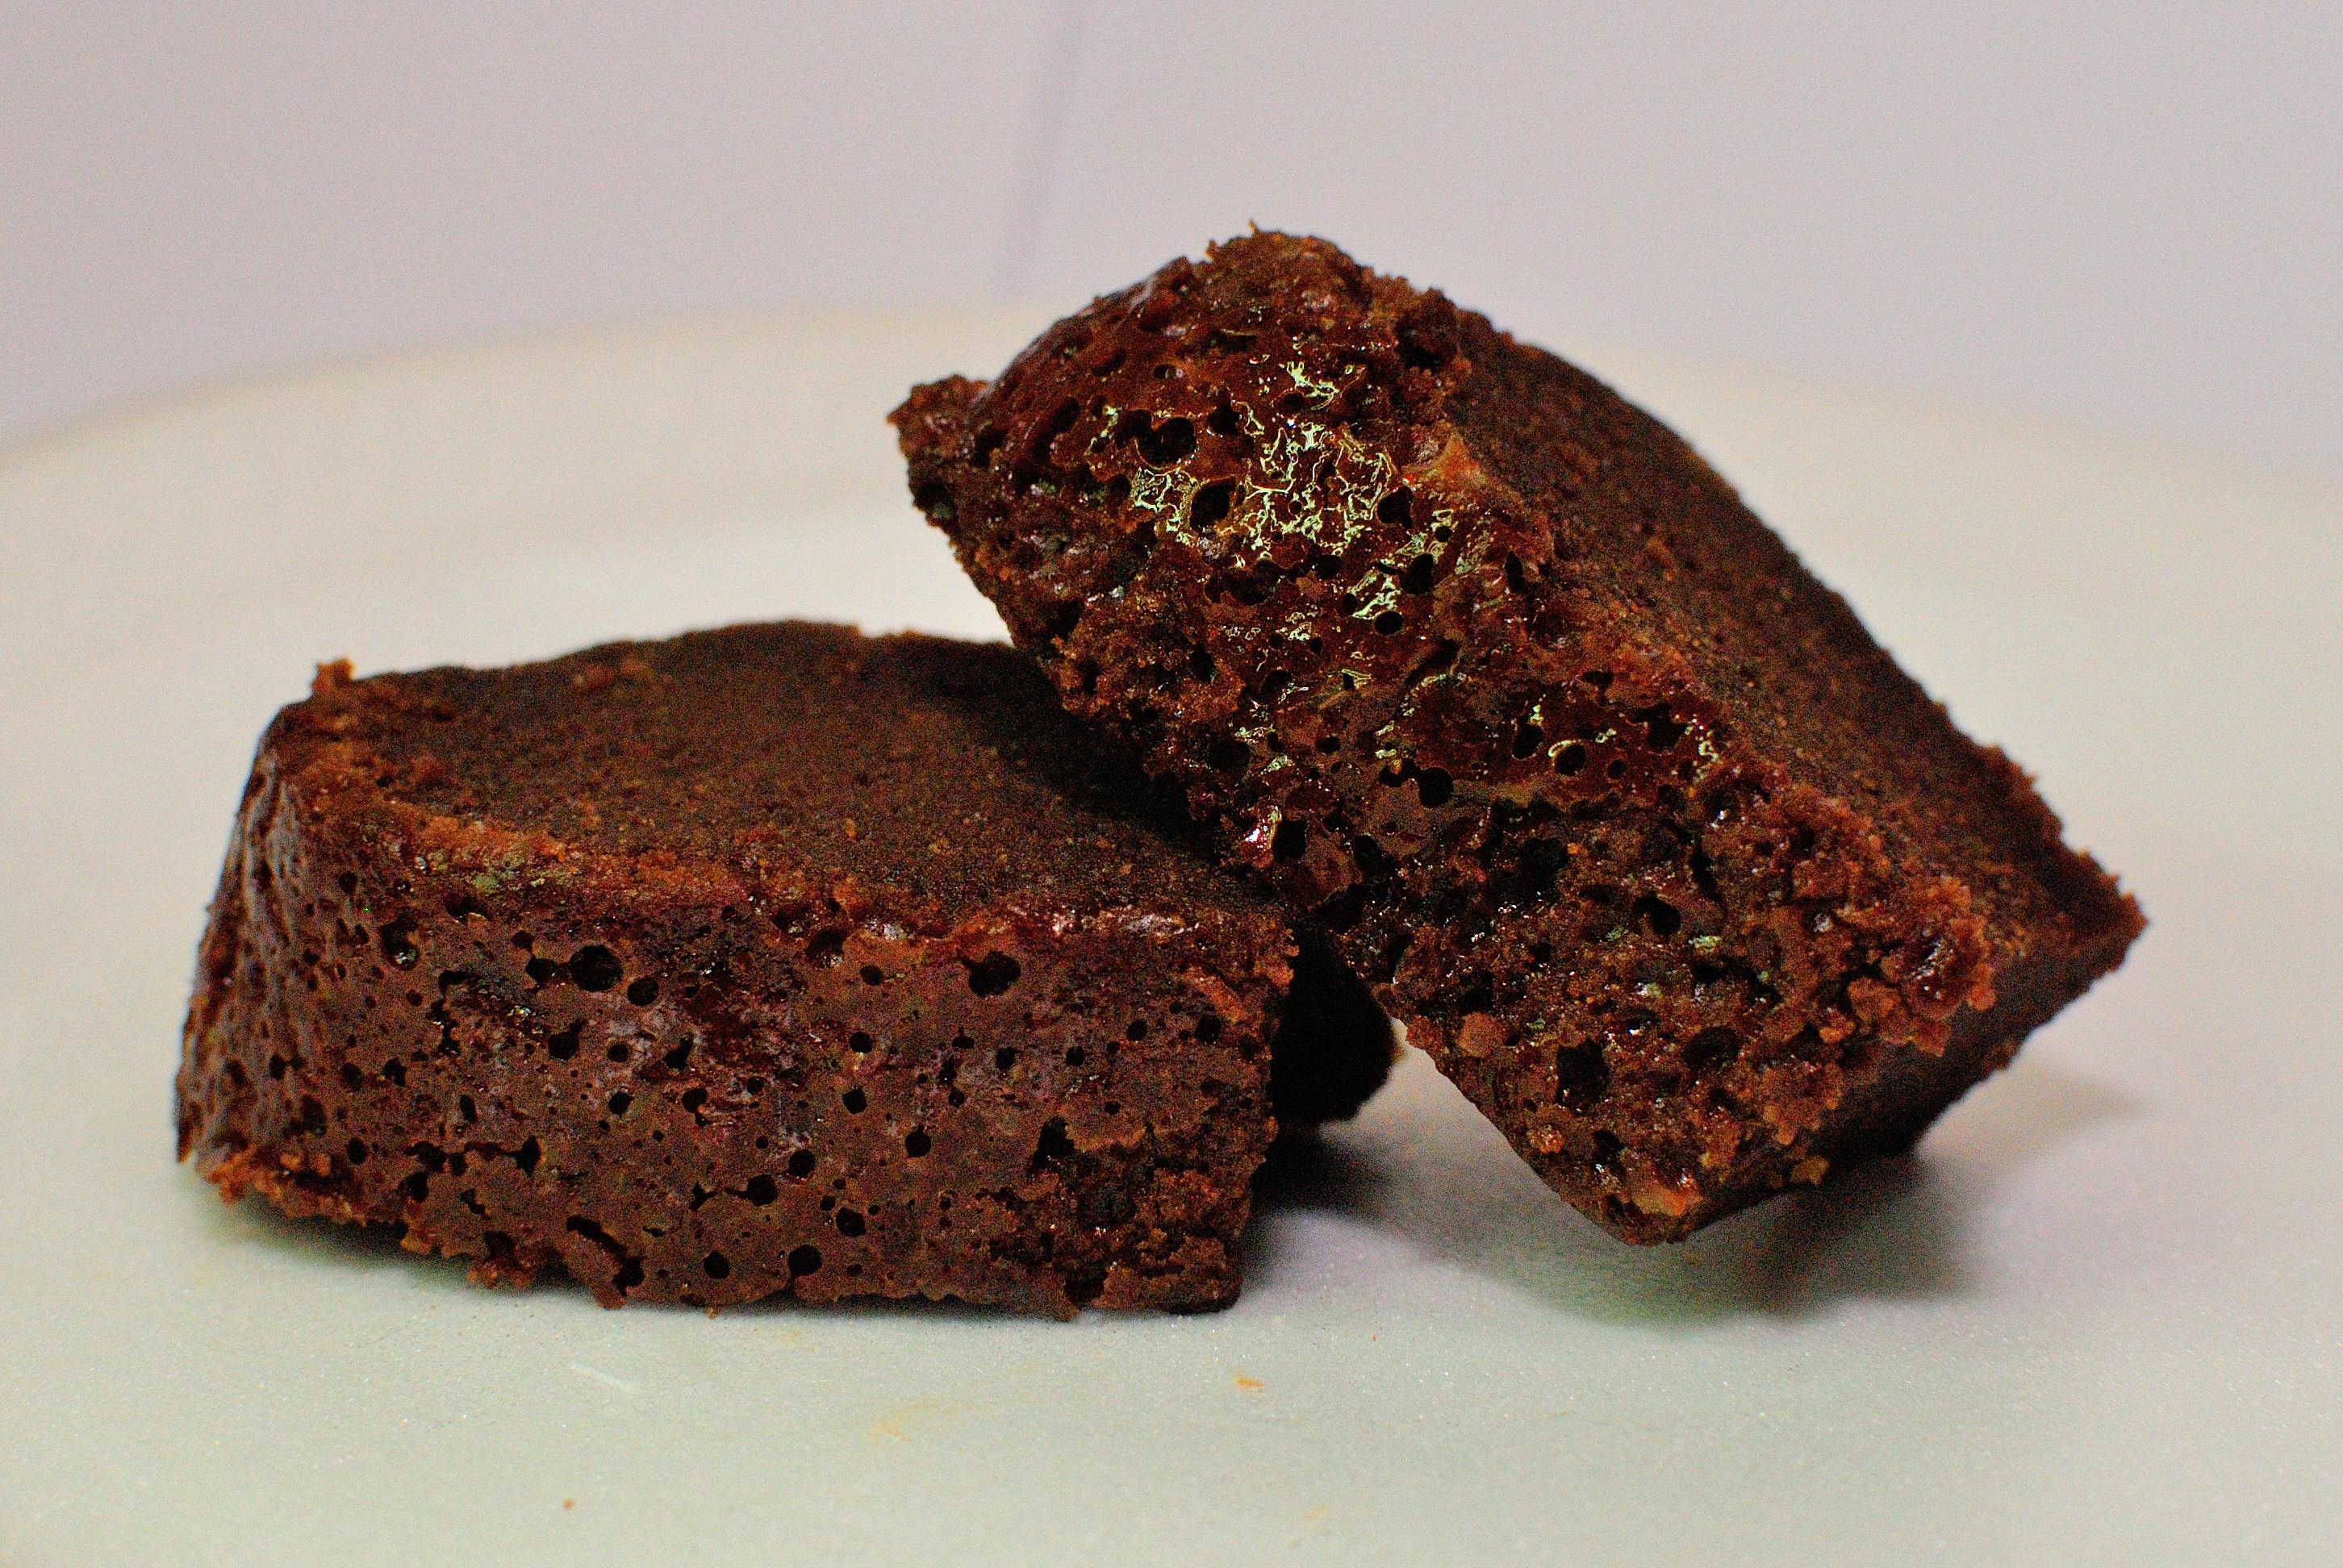 Fudge Recipe – peanut free, tree nut free, dairy free, egg free